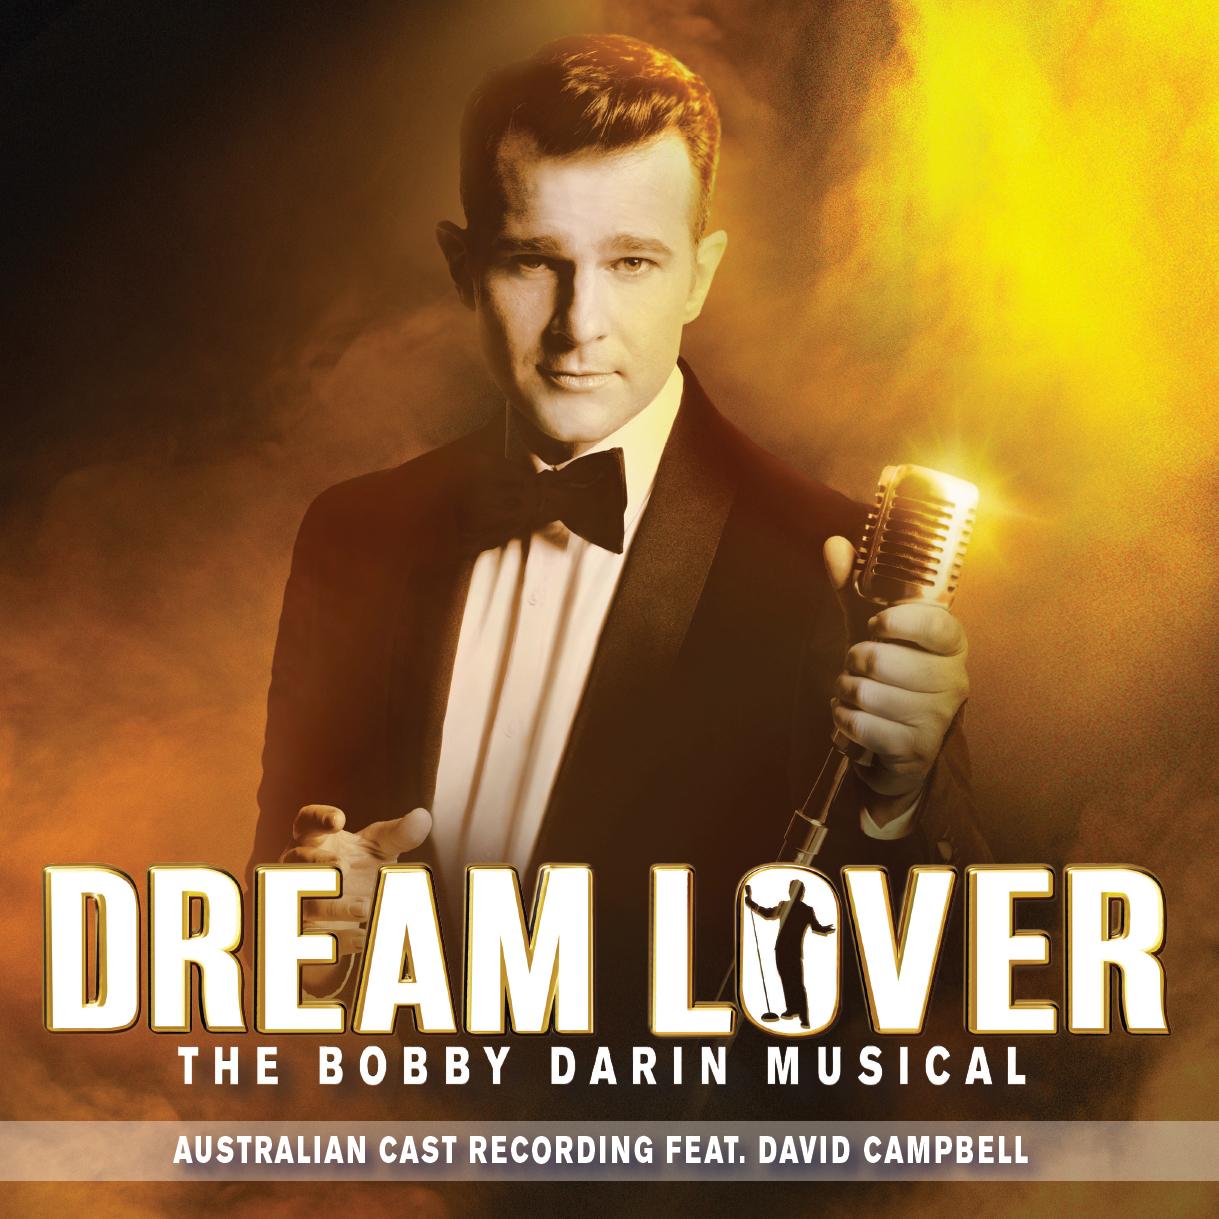 DREAM LOVER Australian Cast Recording Cover